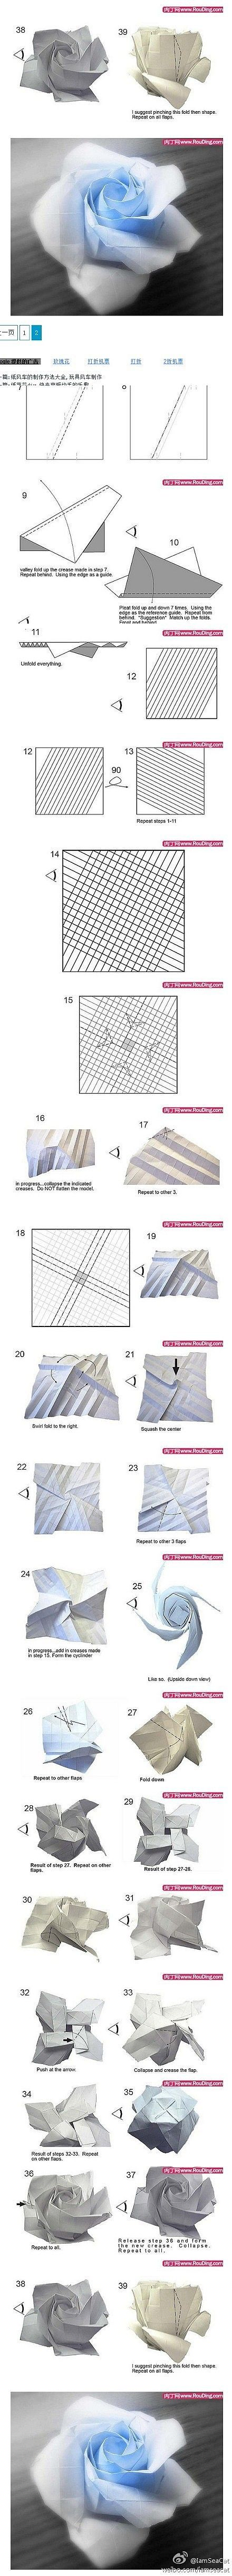 761 Best Paper Craft Images On Pinterest Art Birthdays And Rose Flower Diagram Rosebox Intense Origami